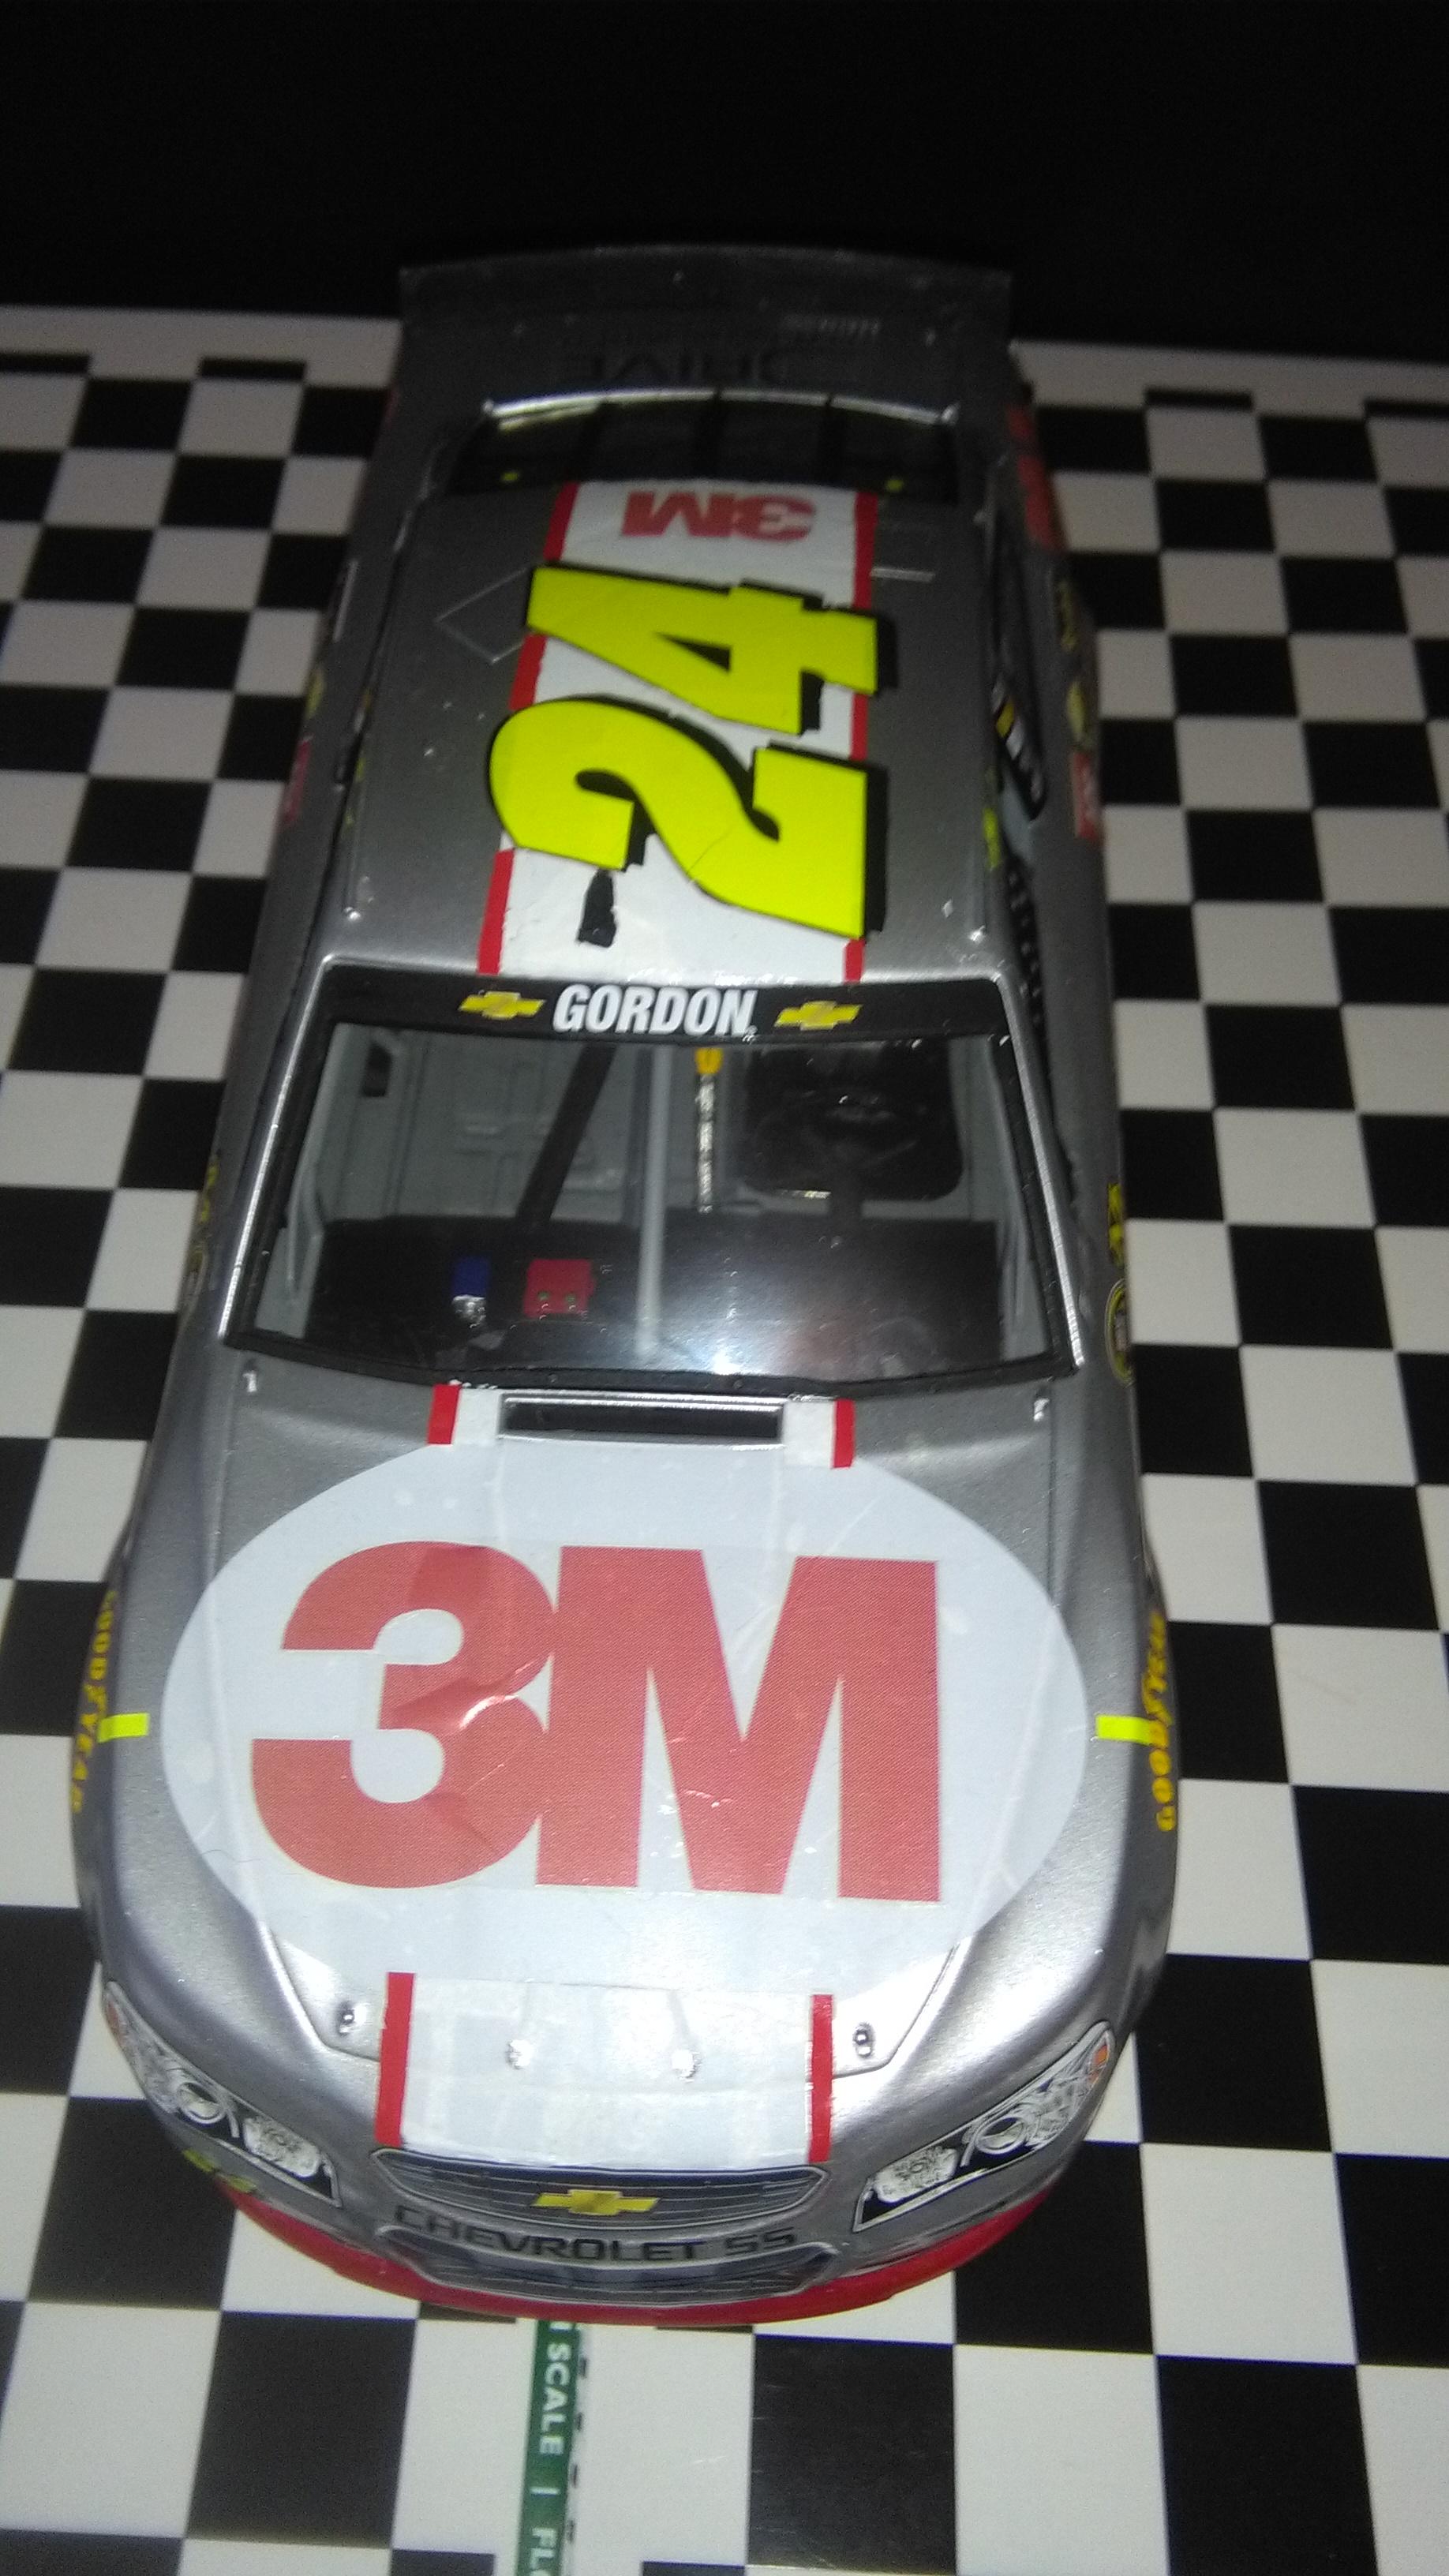 Chevrolet SS 2015 #24 Jeff Gordon 3M 917137IMG20170320183501